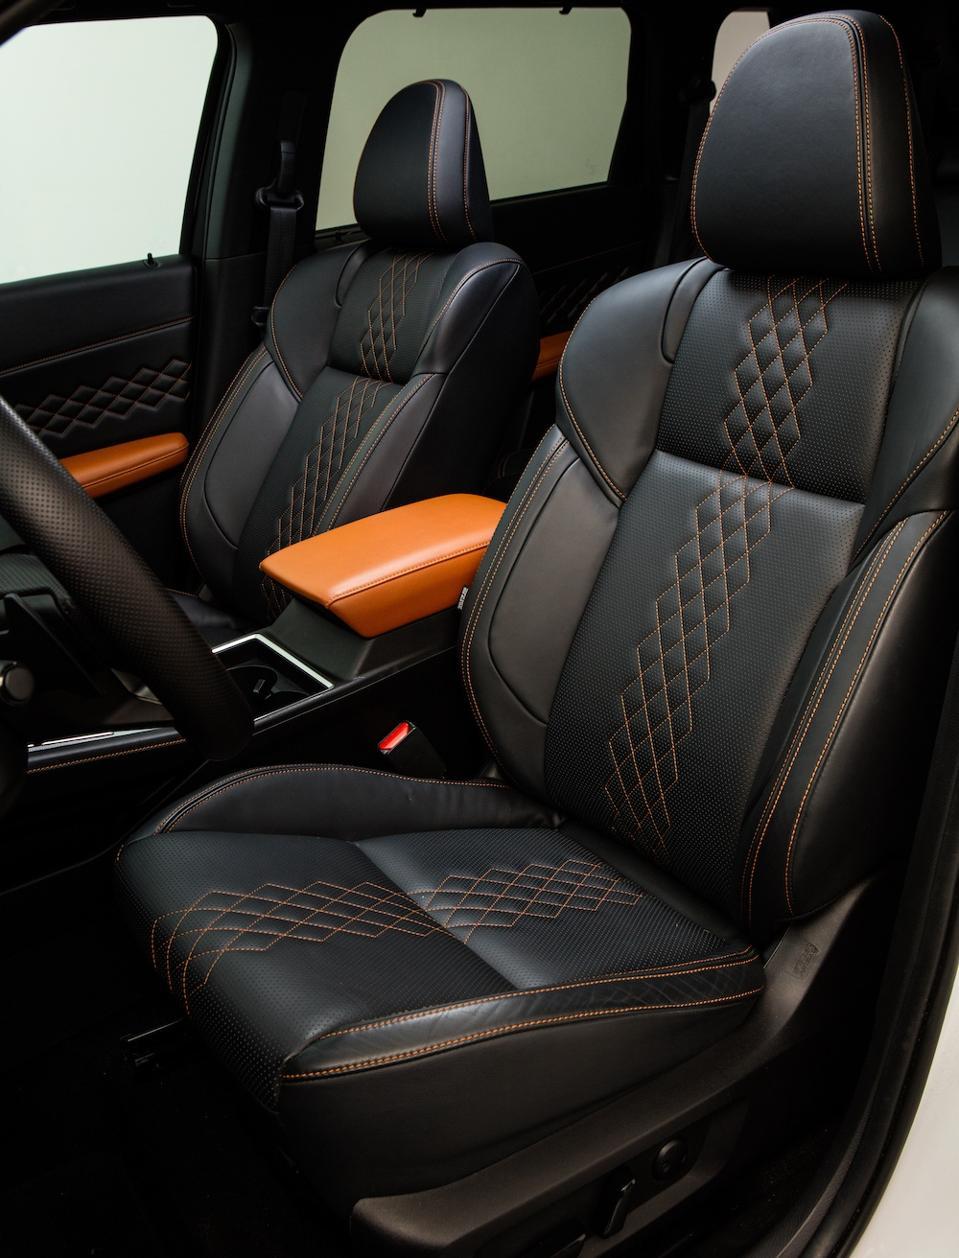 2022 Mitsubishi Outlander Front Seat